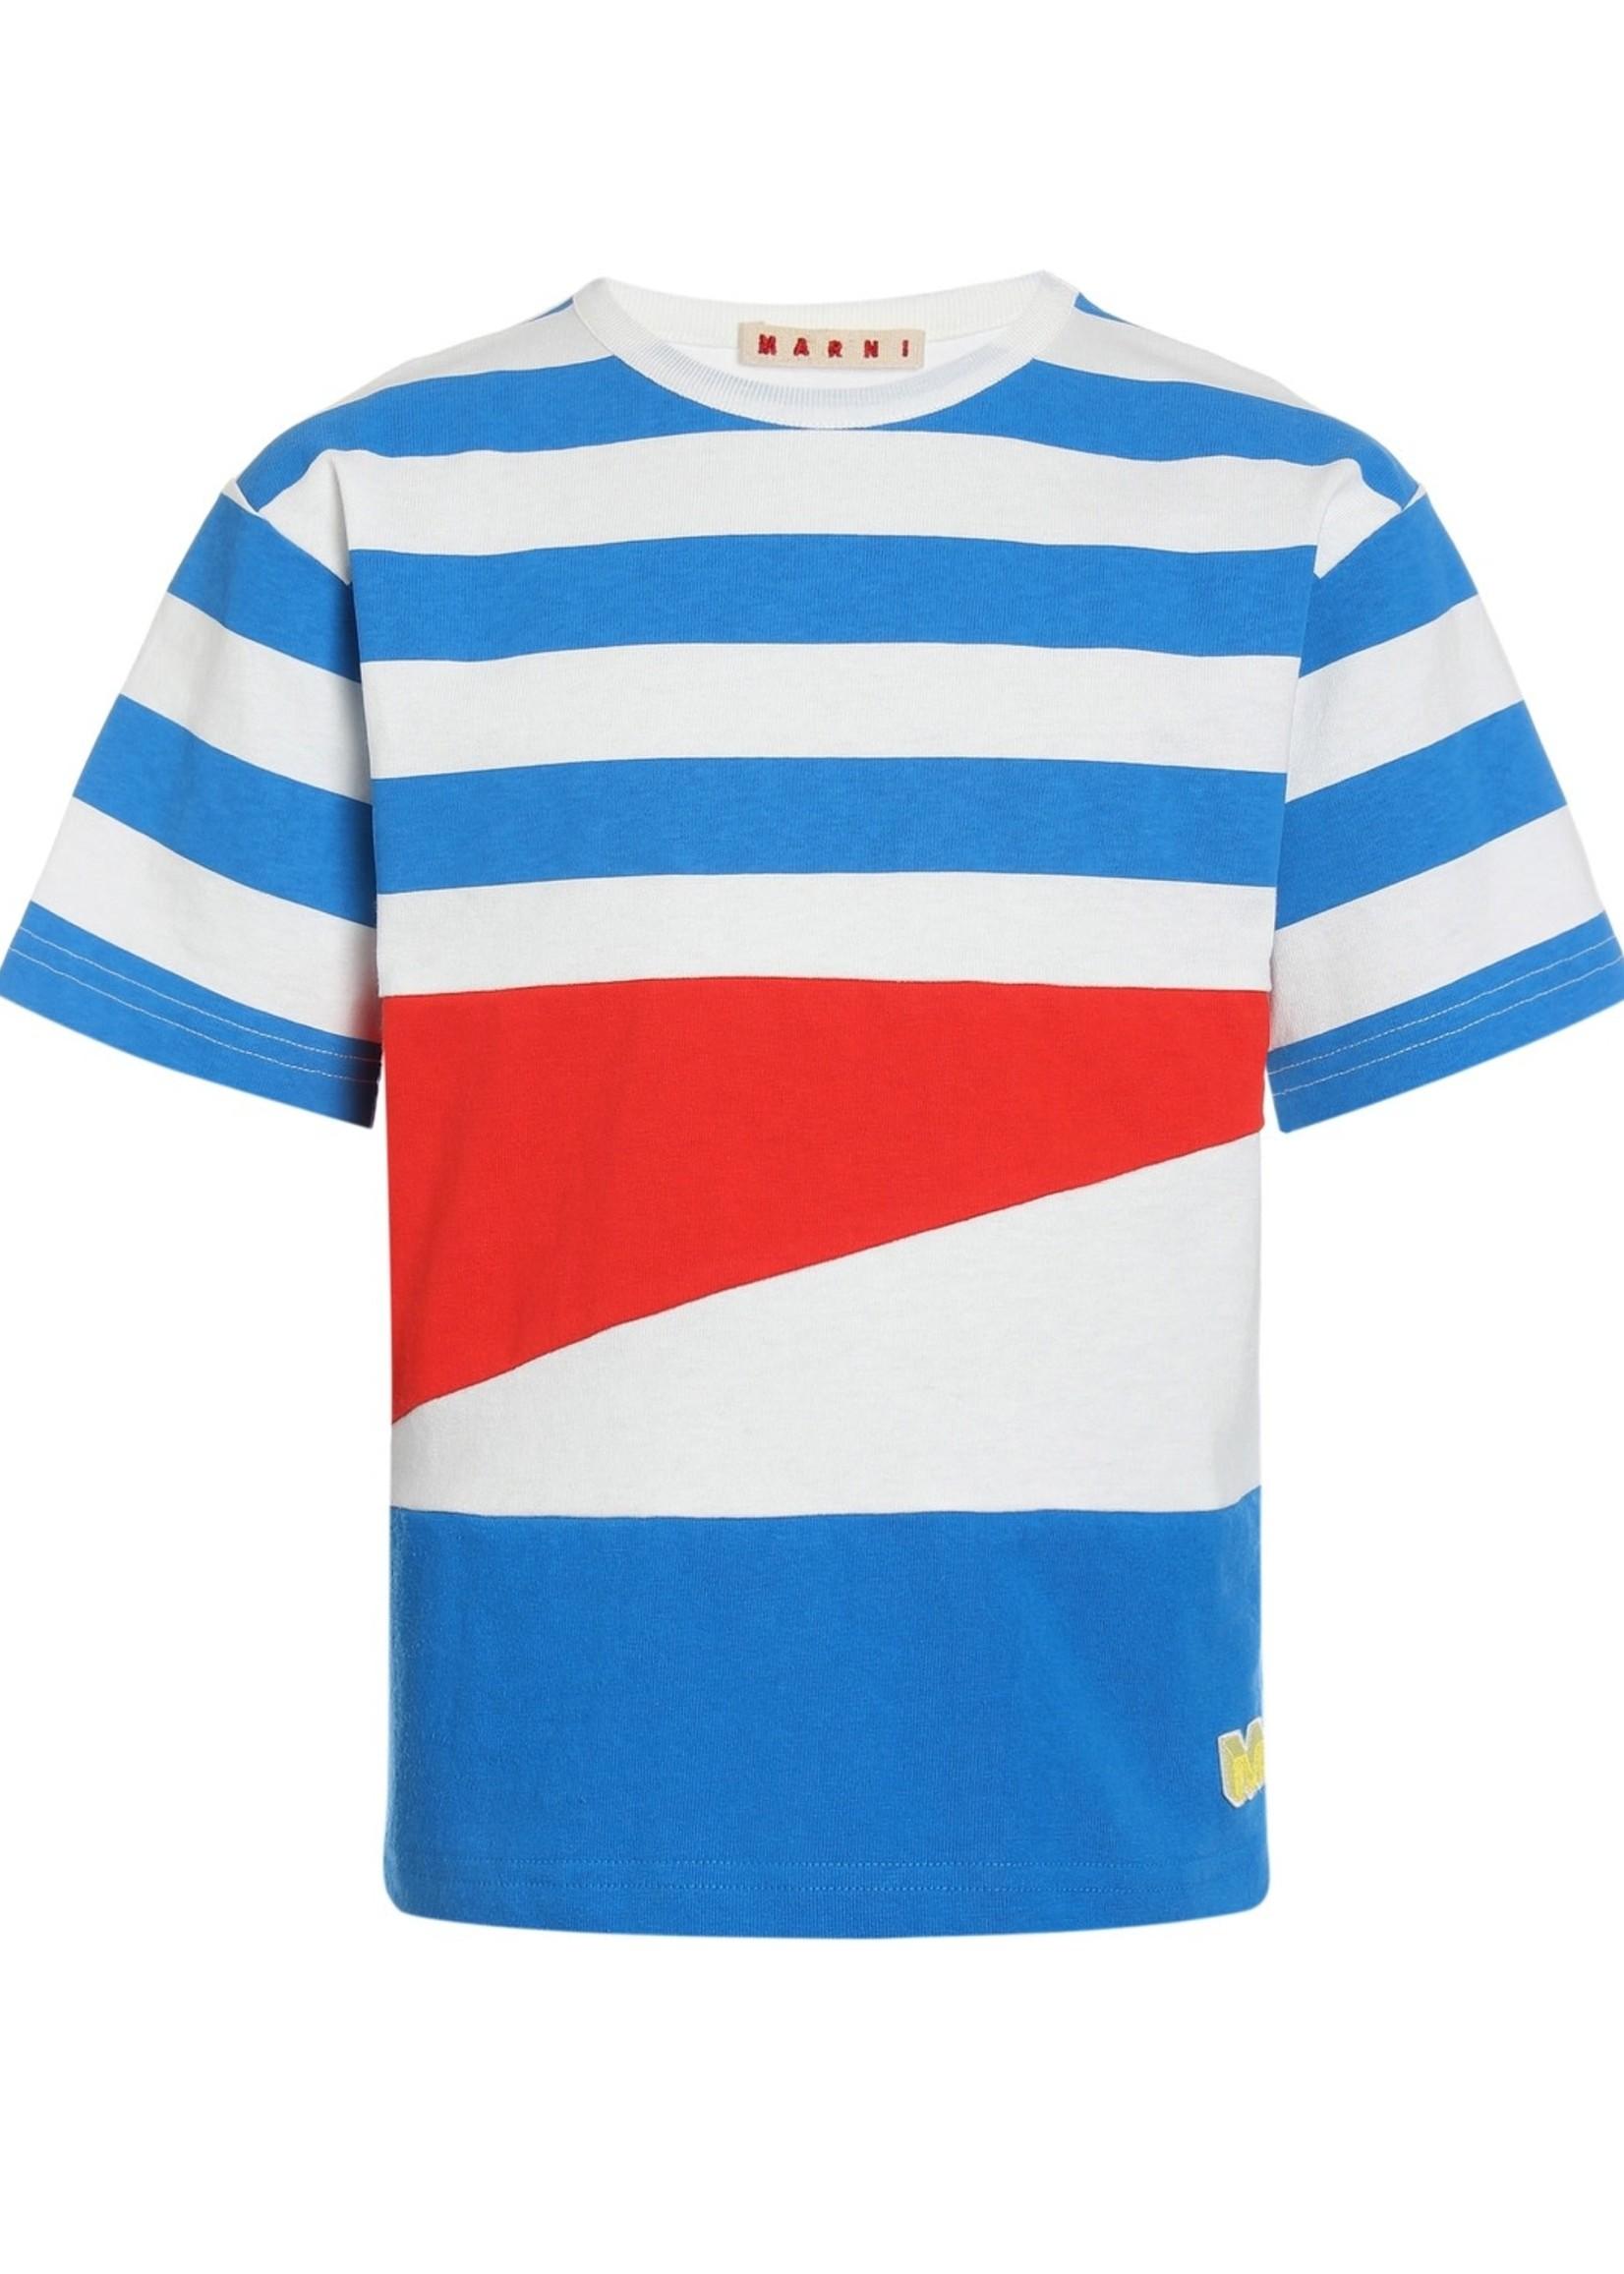 Marni Marni Stipes T-Shirt